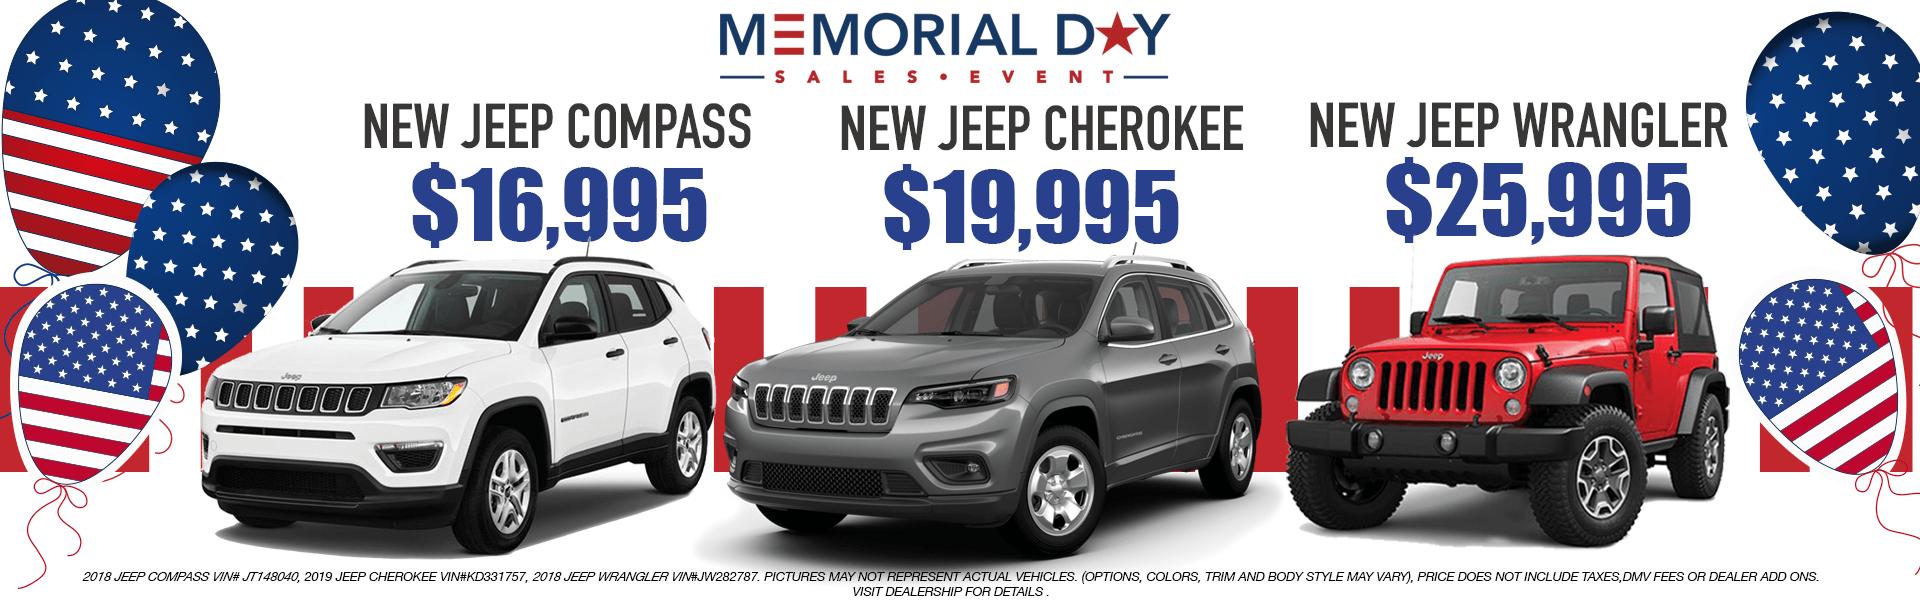 Jeeps: Compass,Cherokee,Wrangler